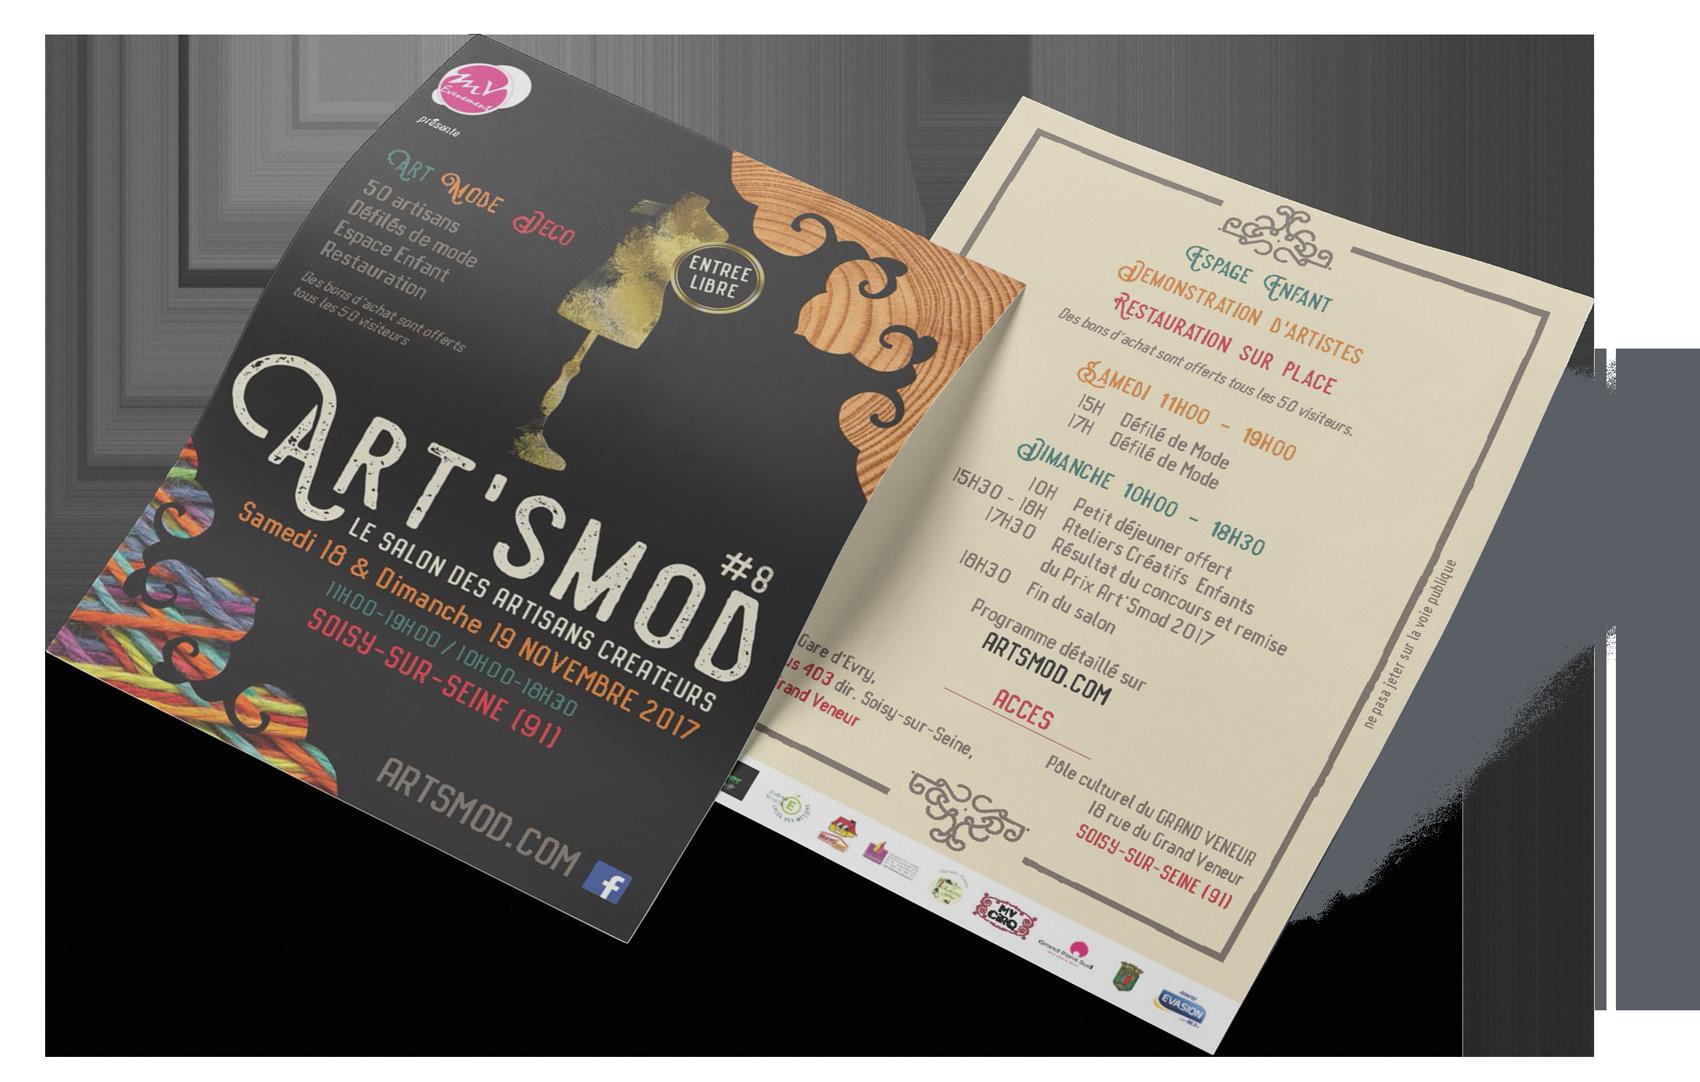 5-Affiche_2017-Artsmod-MVC_Page_1